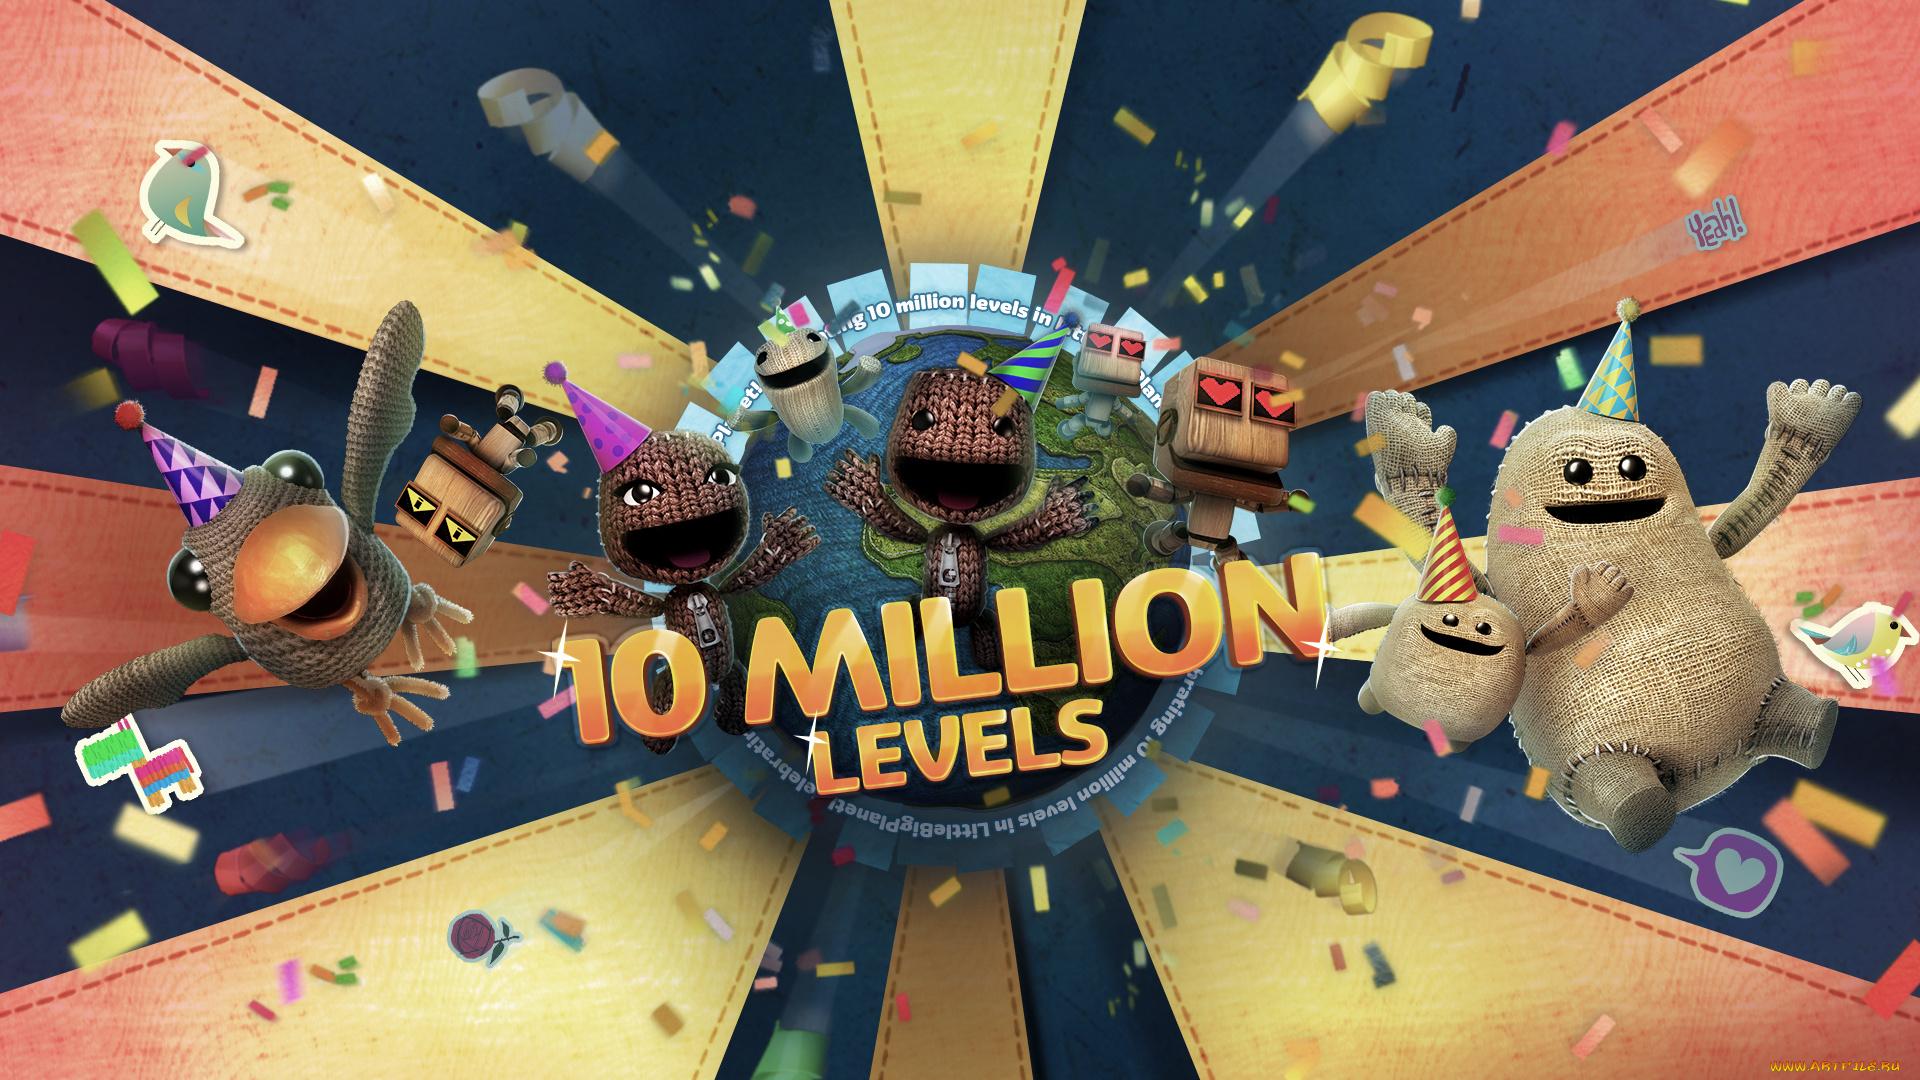 графика игры The Little Big Planet graphics game  № 1878145 бесплатно